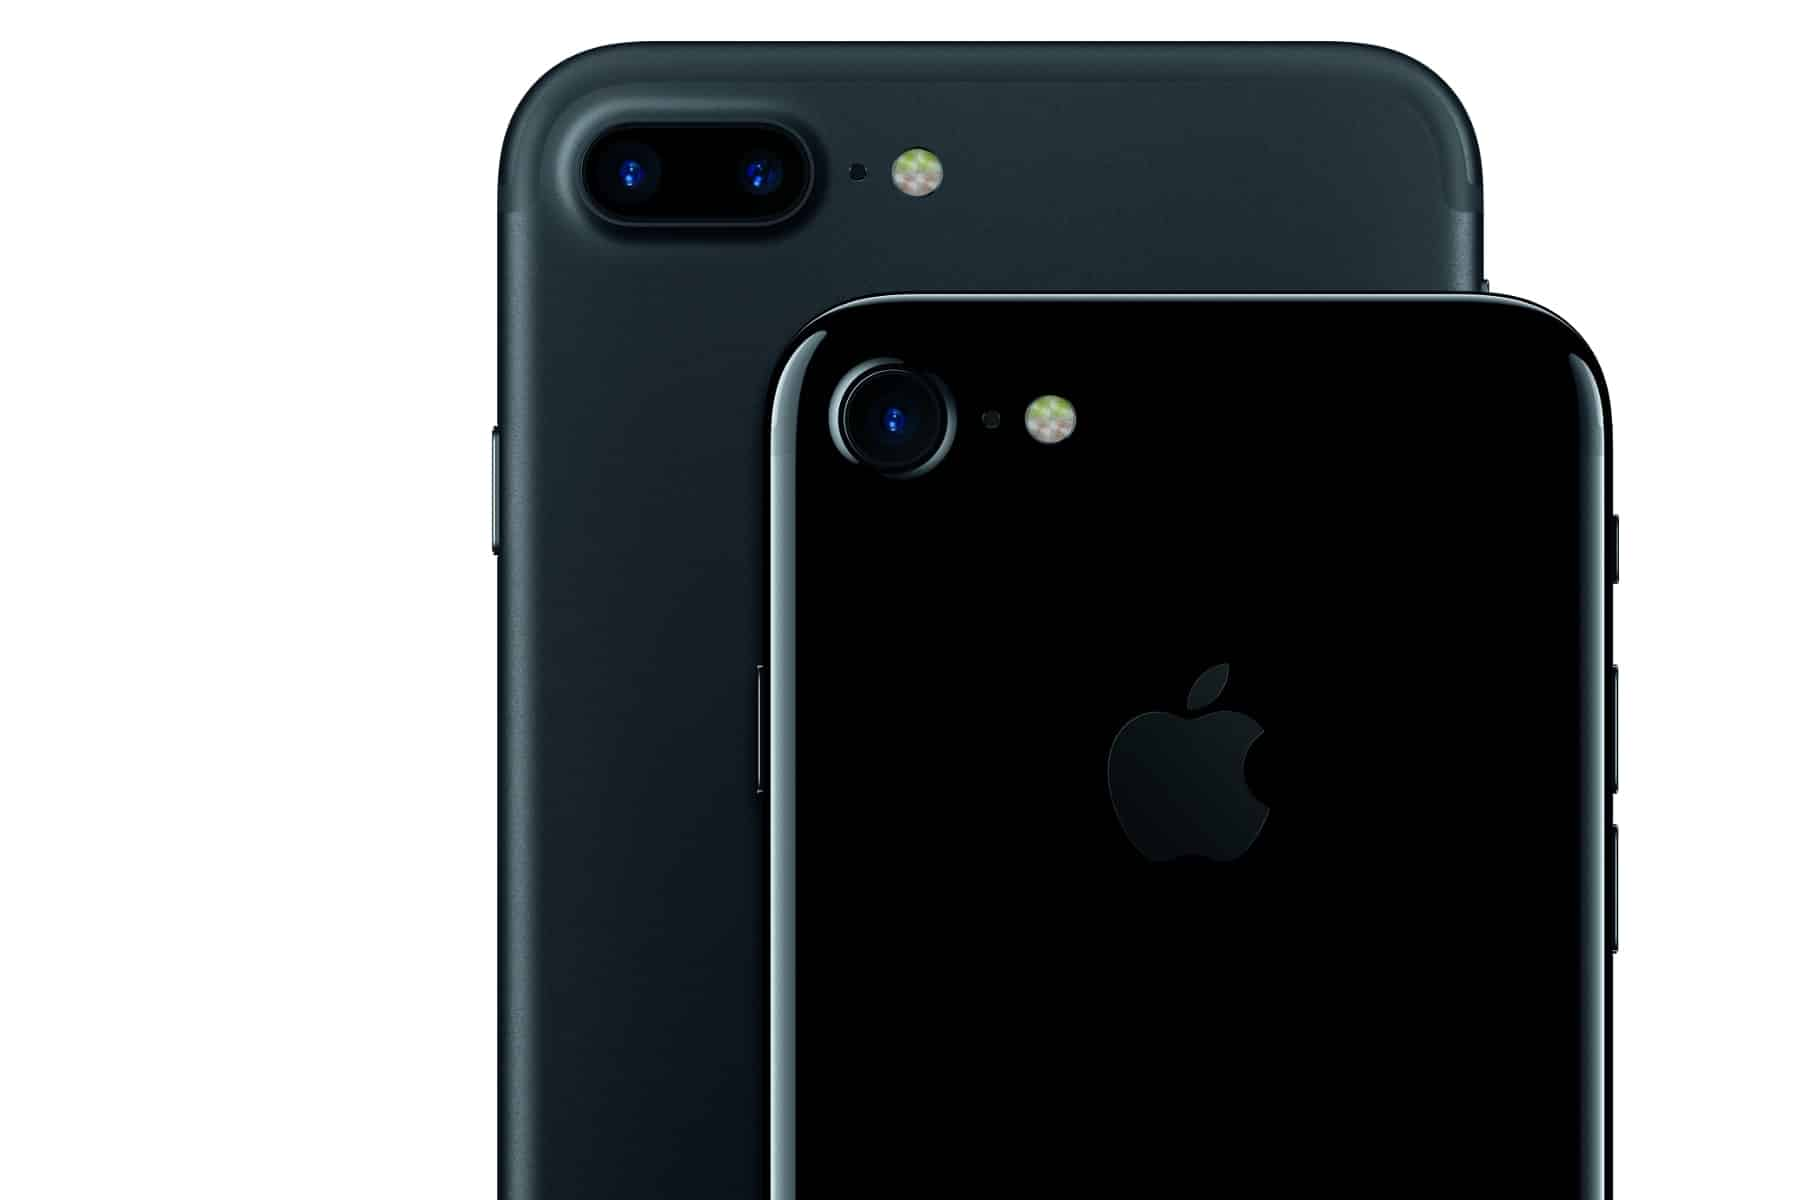 réparation iphone ajaccio